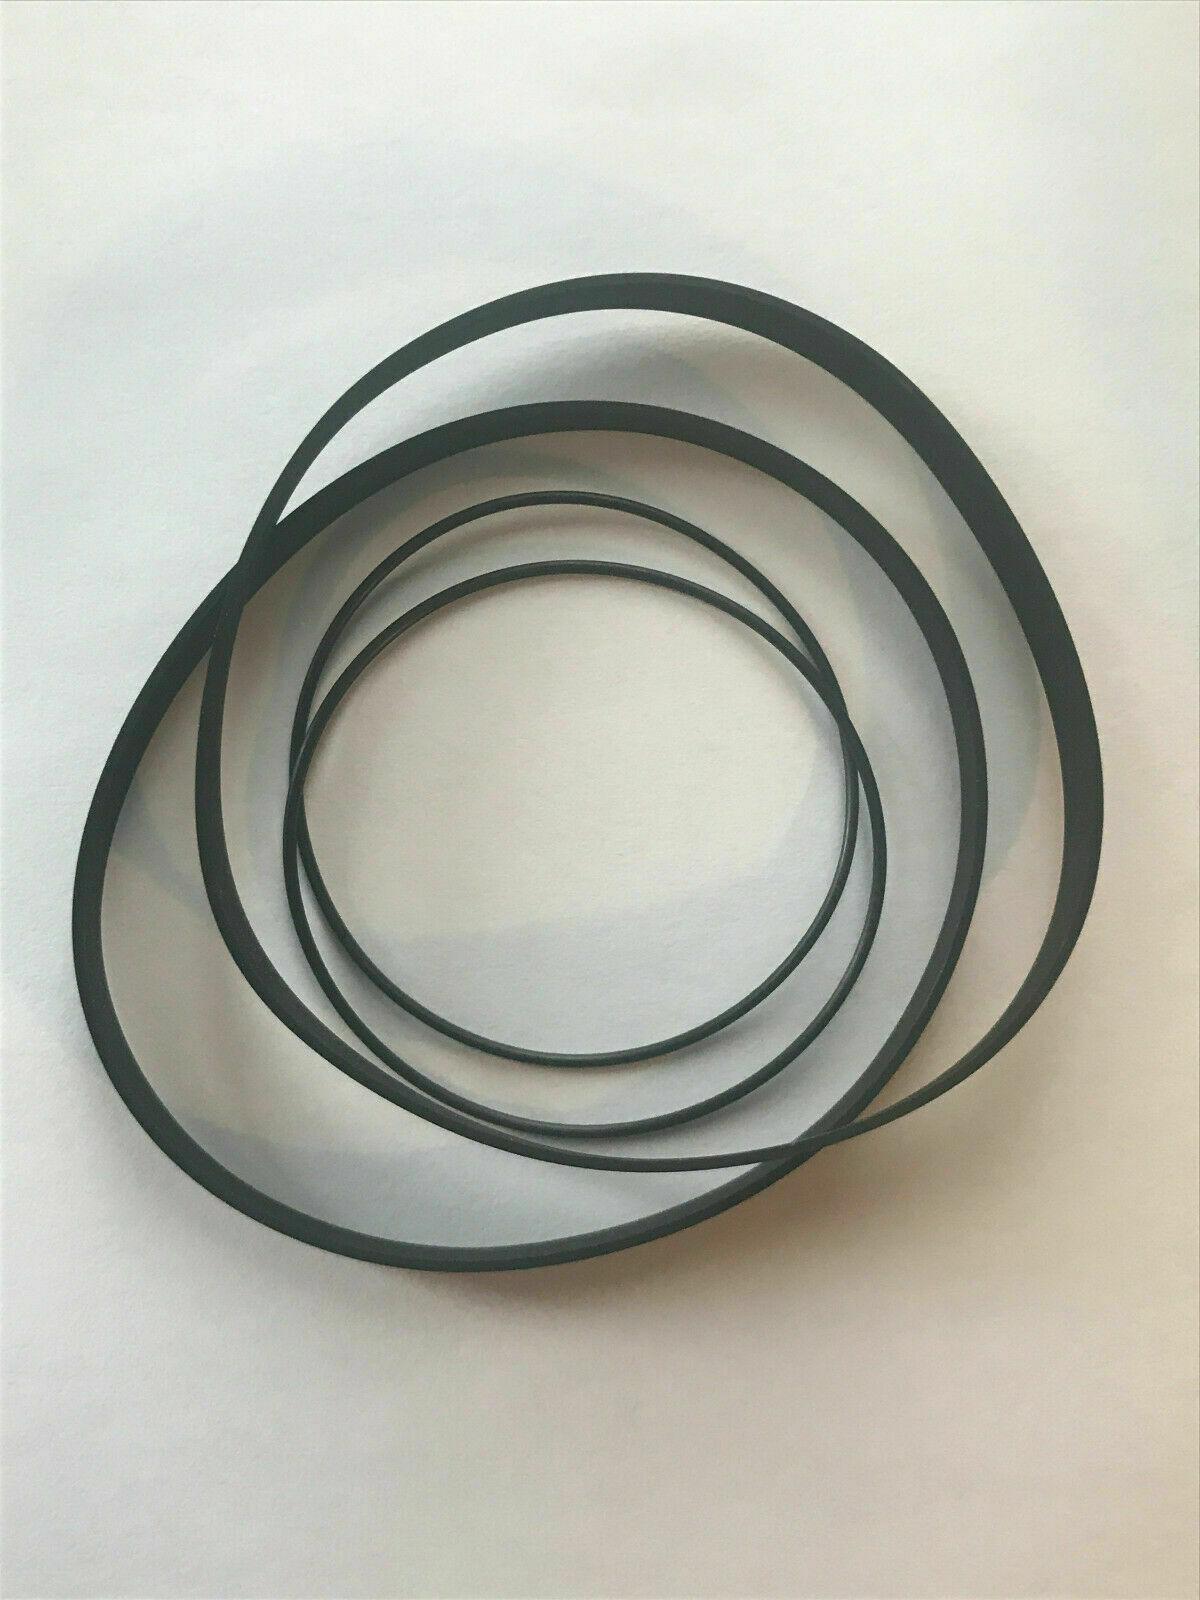 4 Belts Sony TC-WR681 TCWR681 Belt Kit For Cassette Deck